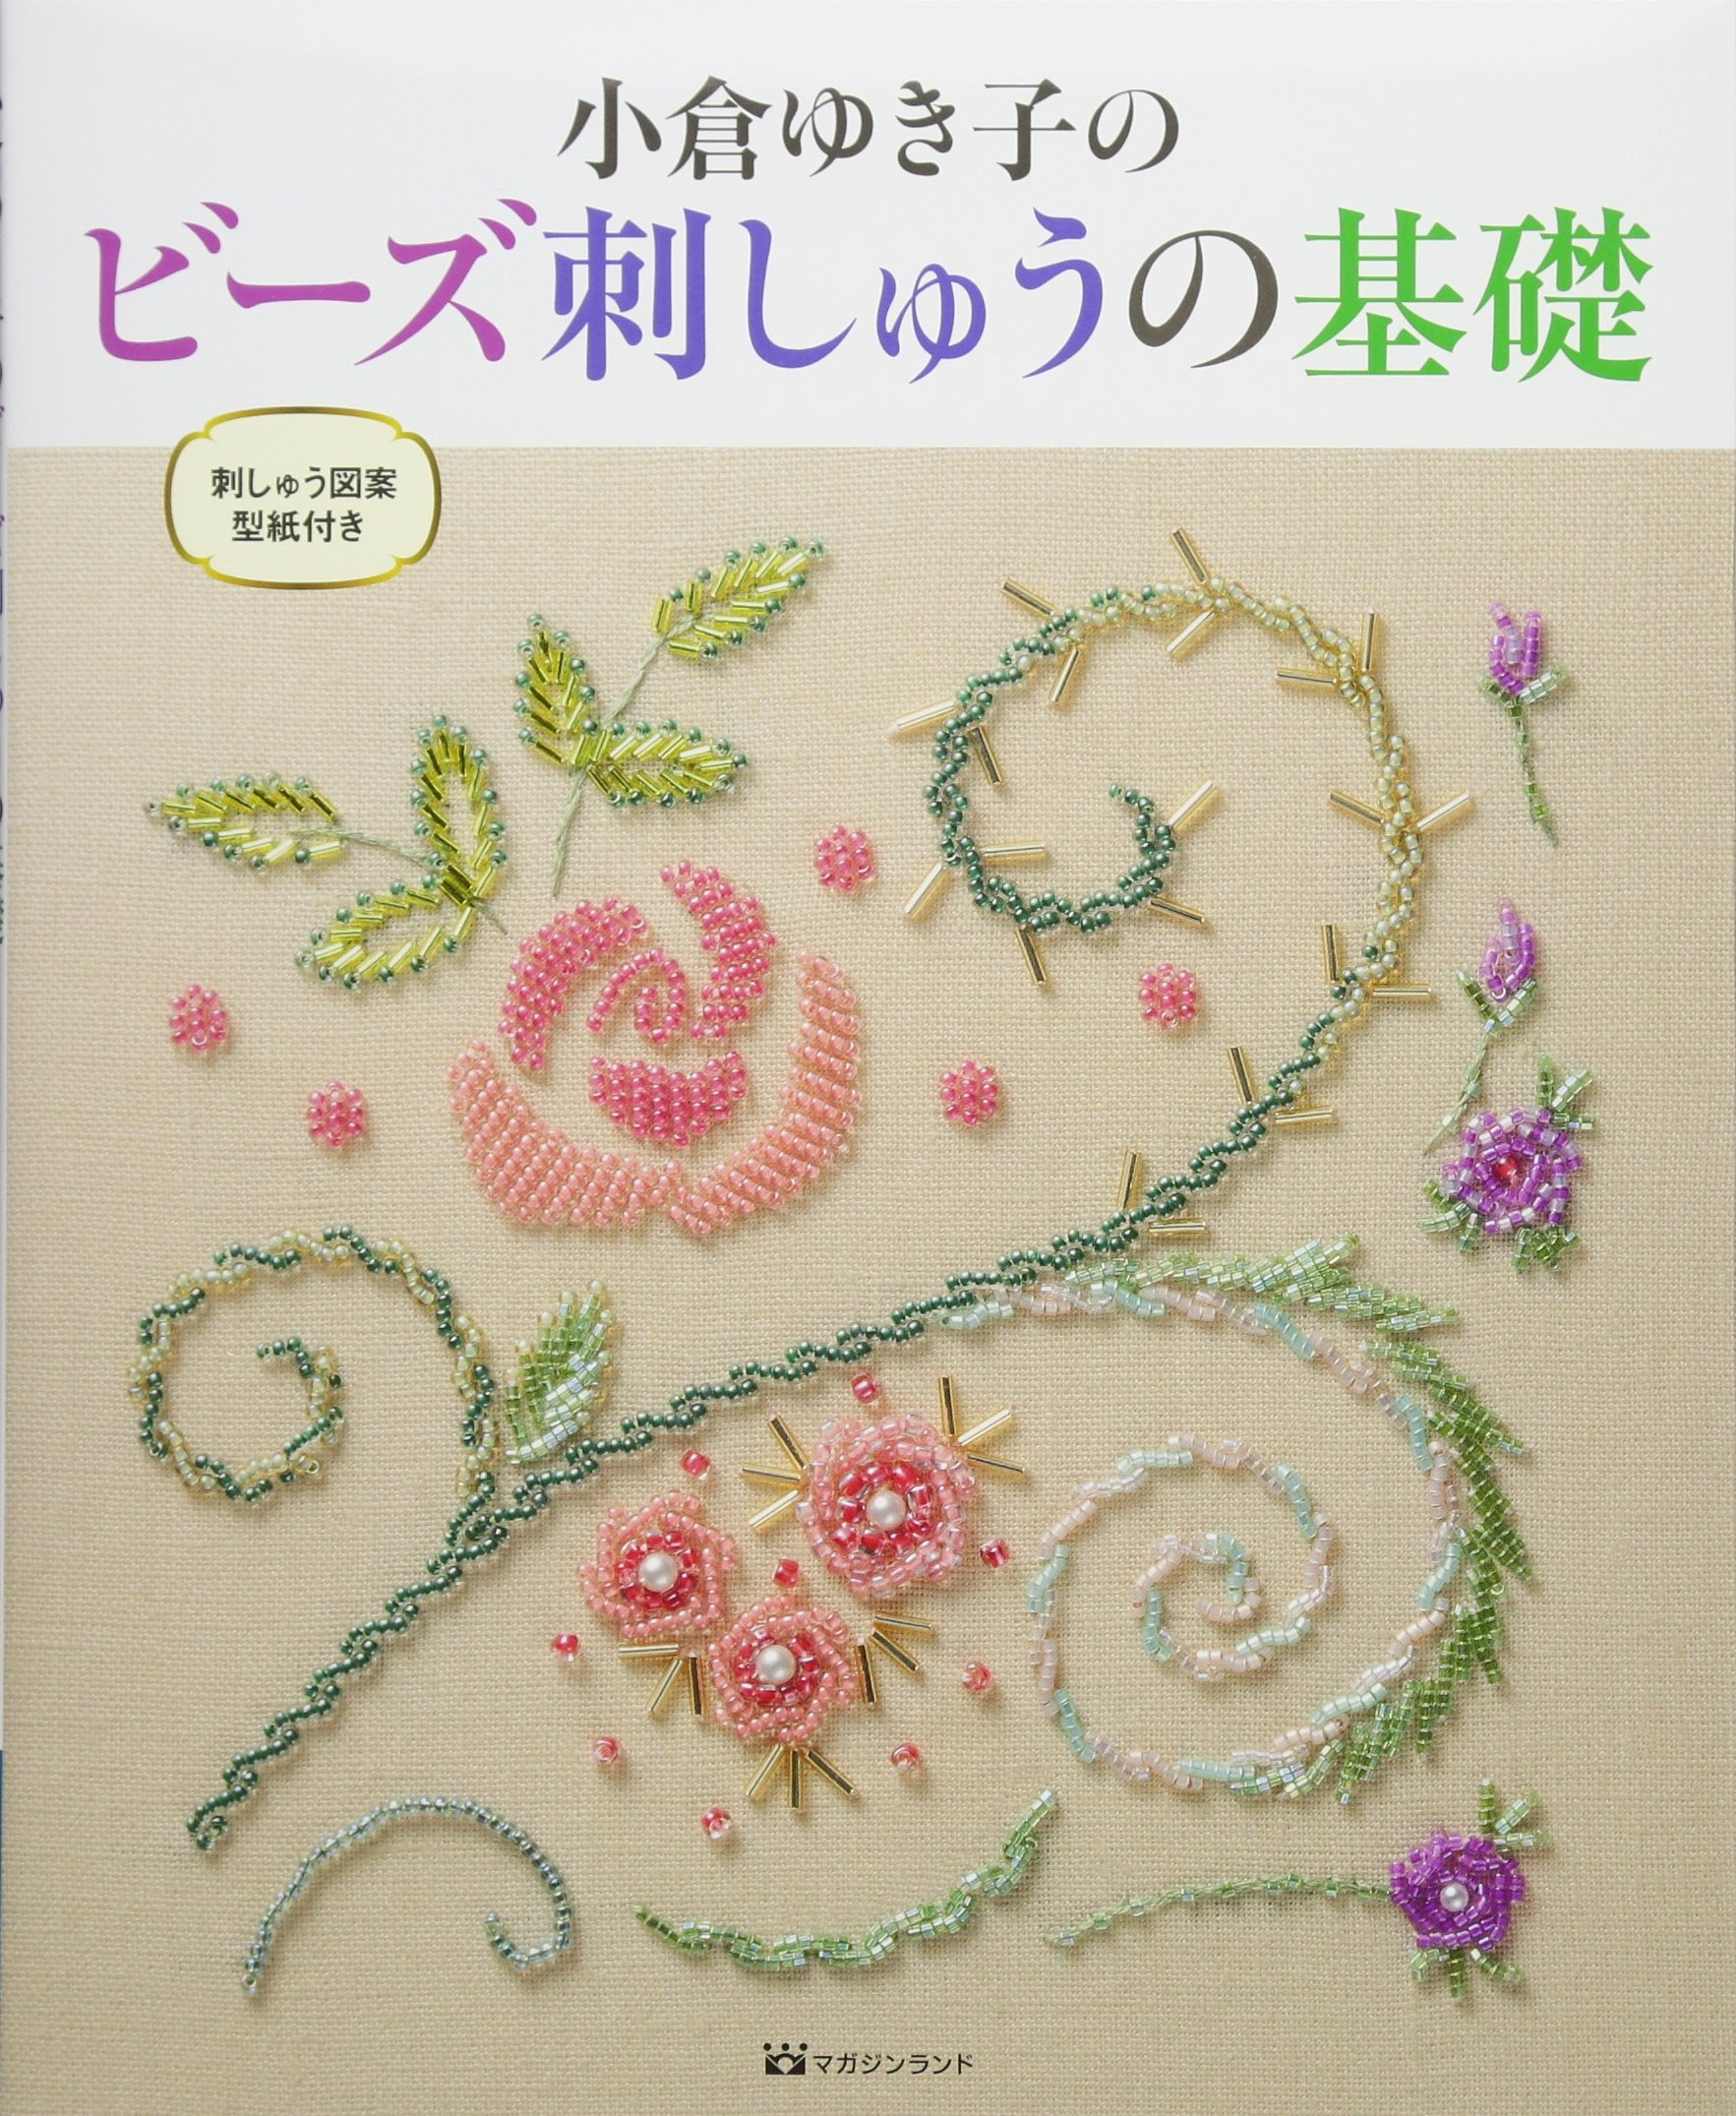 Yukiko Ogura Bead Embroidery Foundation